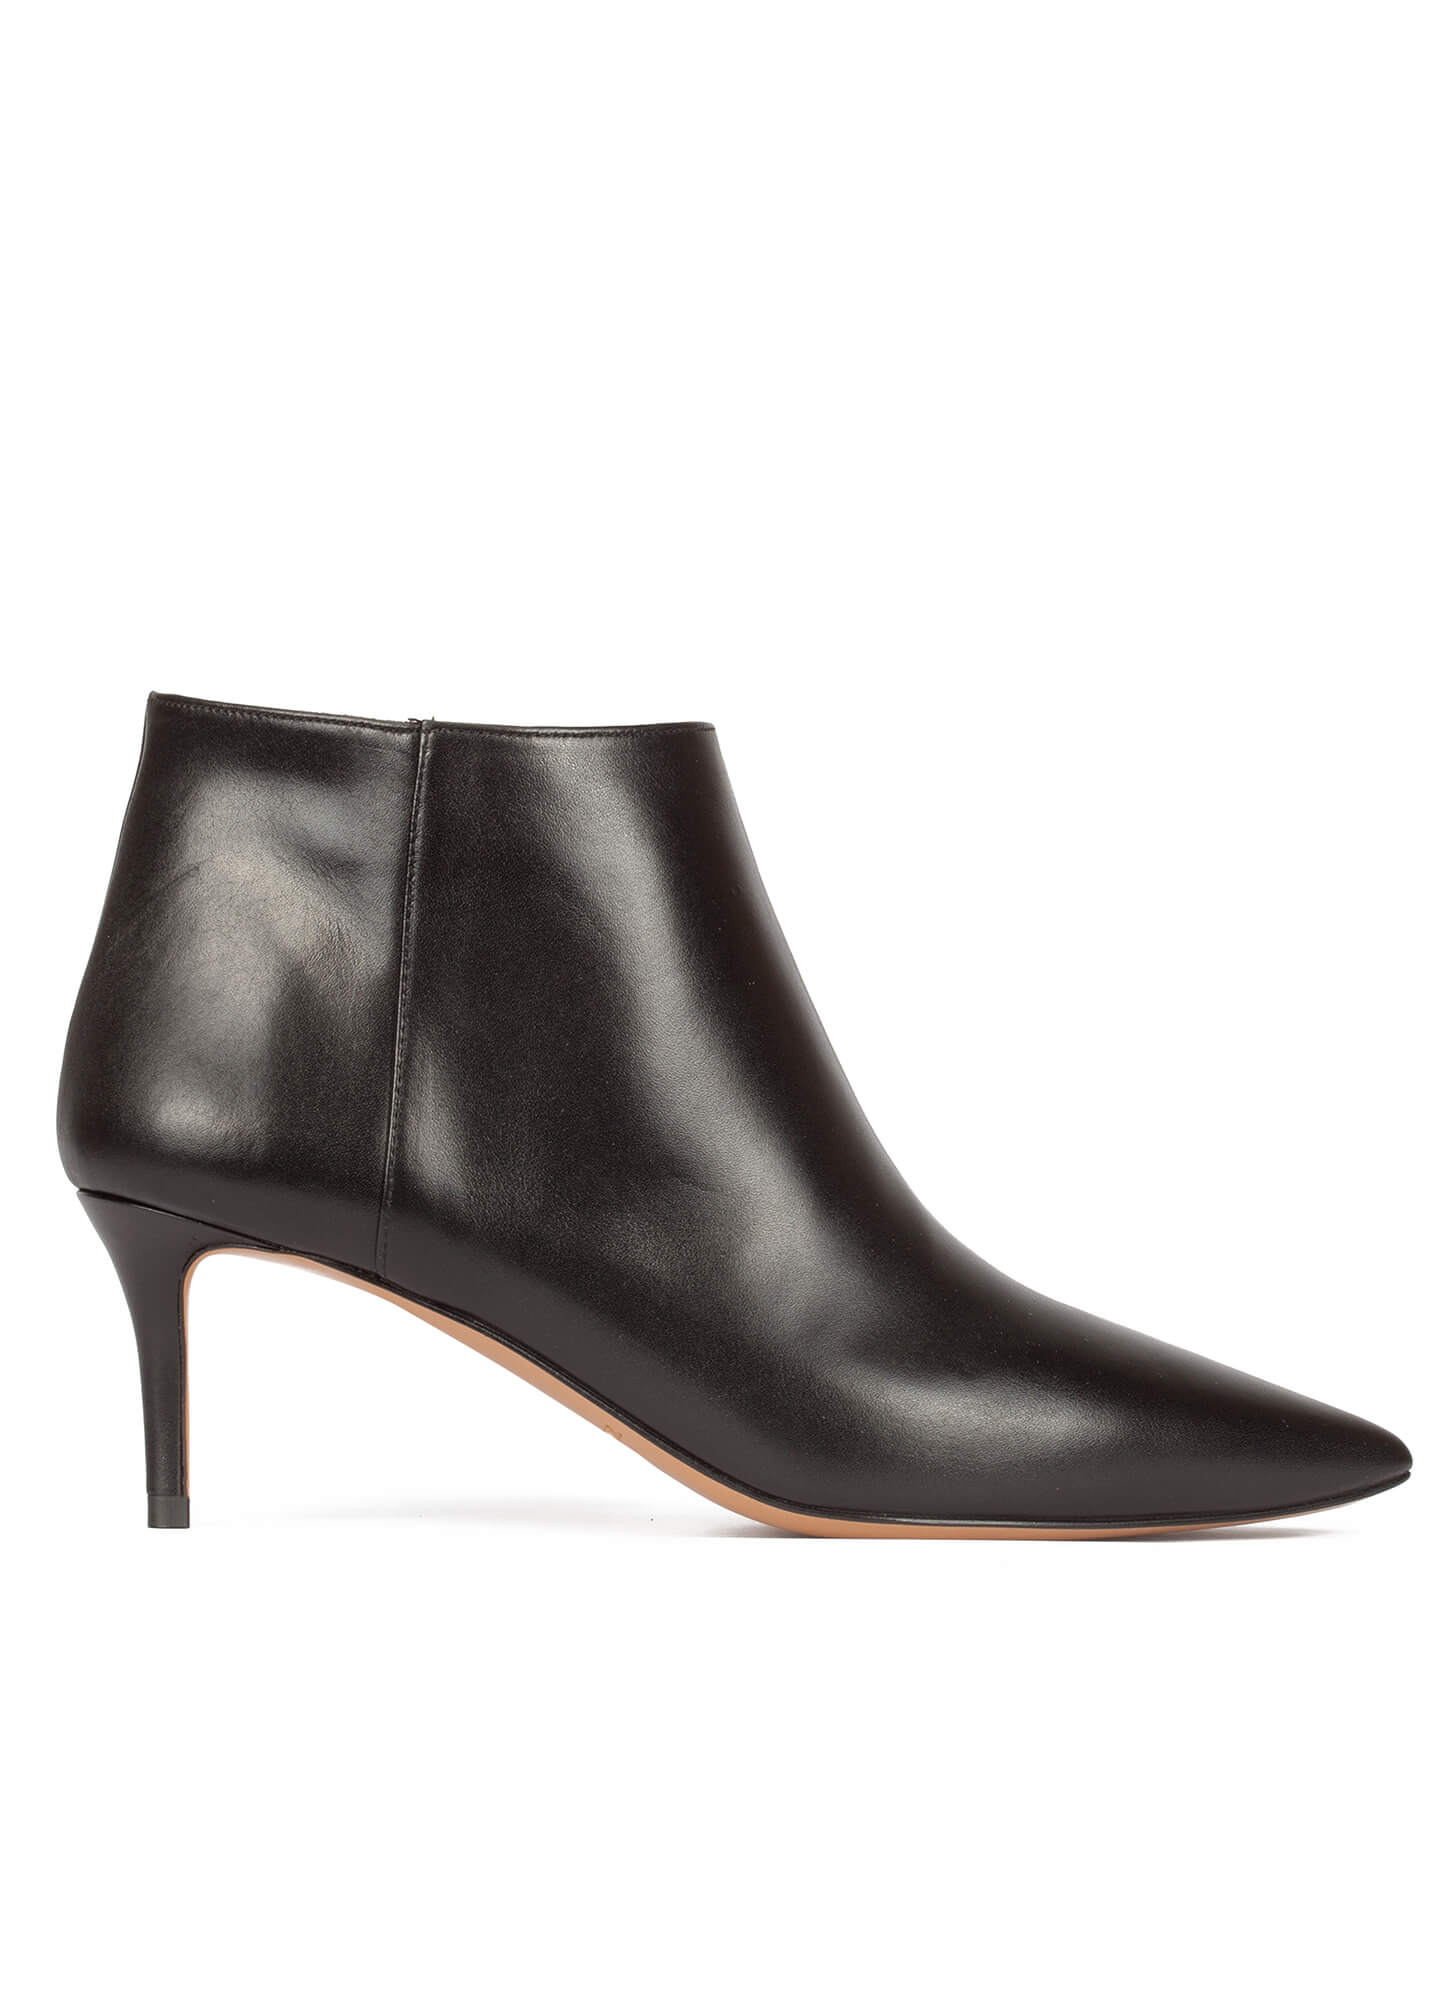 Black leather mid heel ankle boots - online shoe store Pura Lopez ...